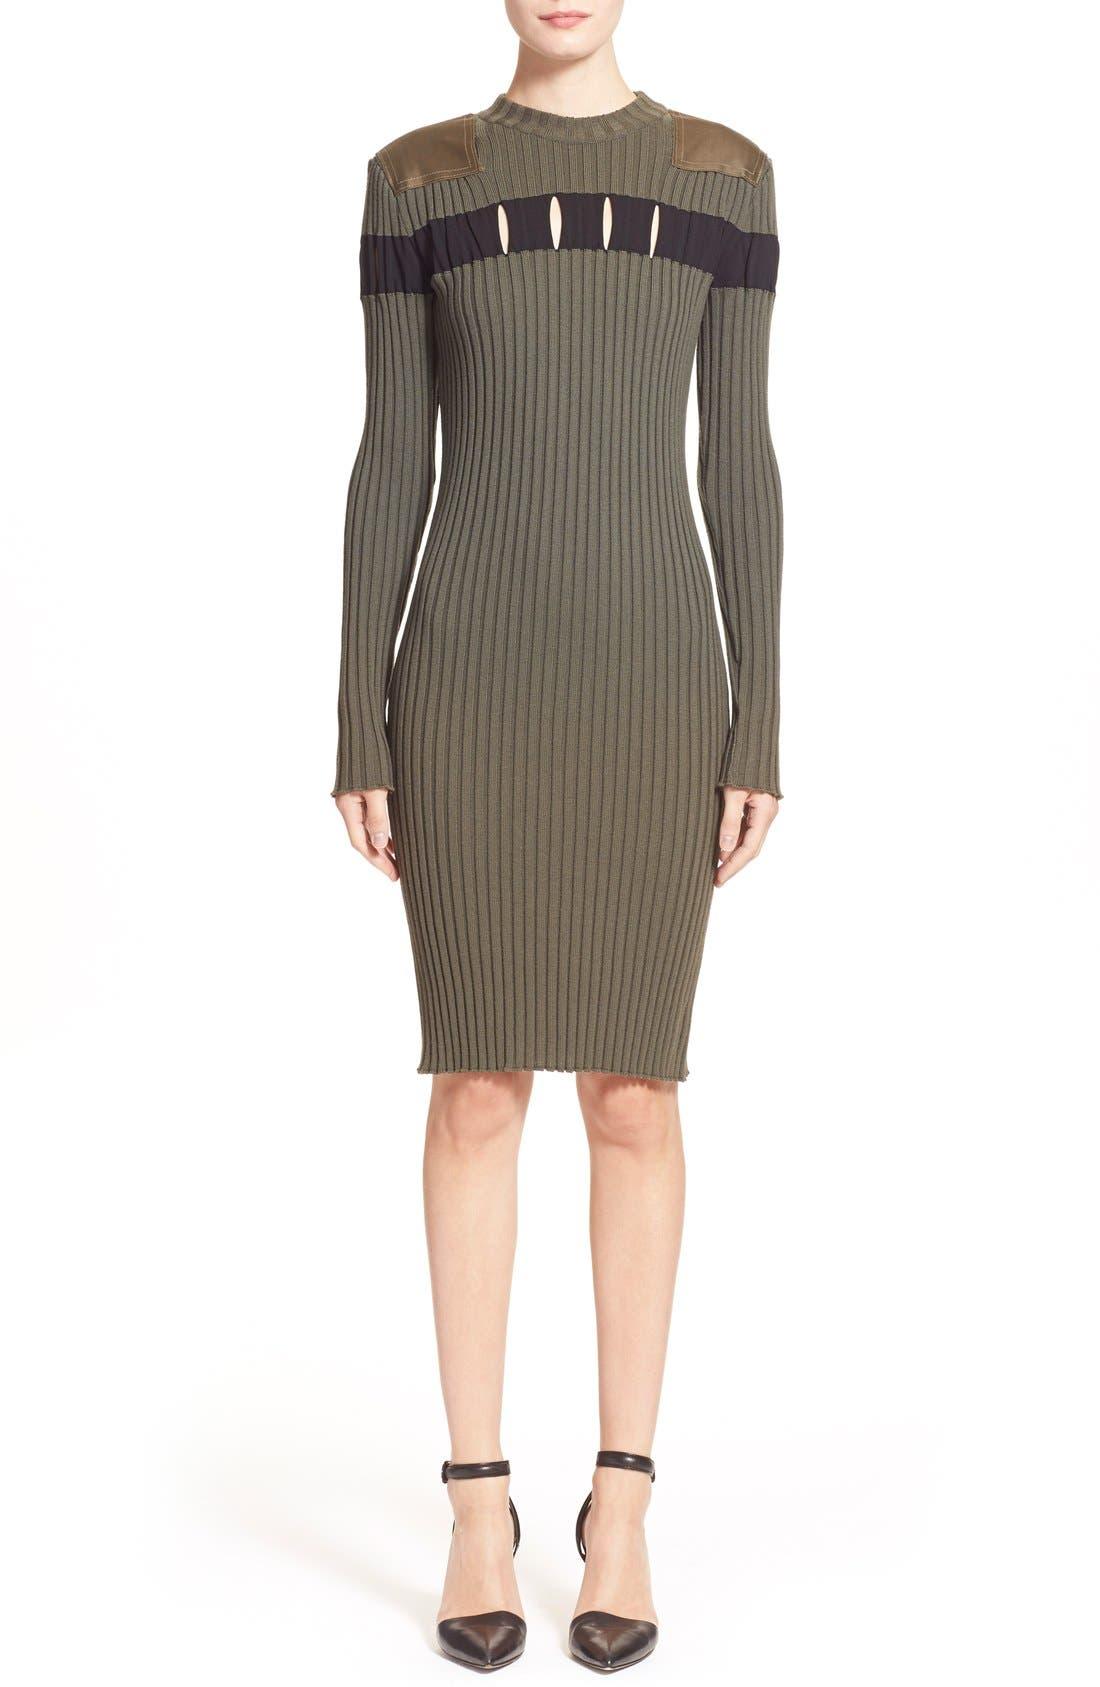 Alternate Image 1 Selected - Alexander Wang Perforated Stripe Rib Knit Wool Dress